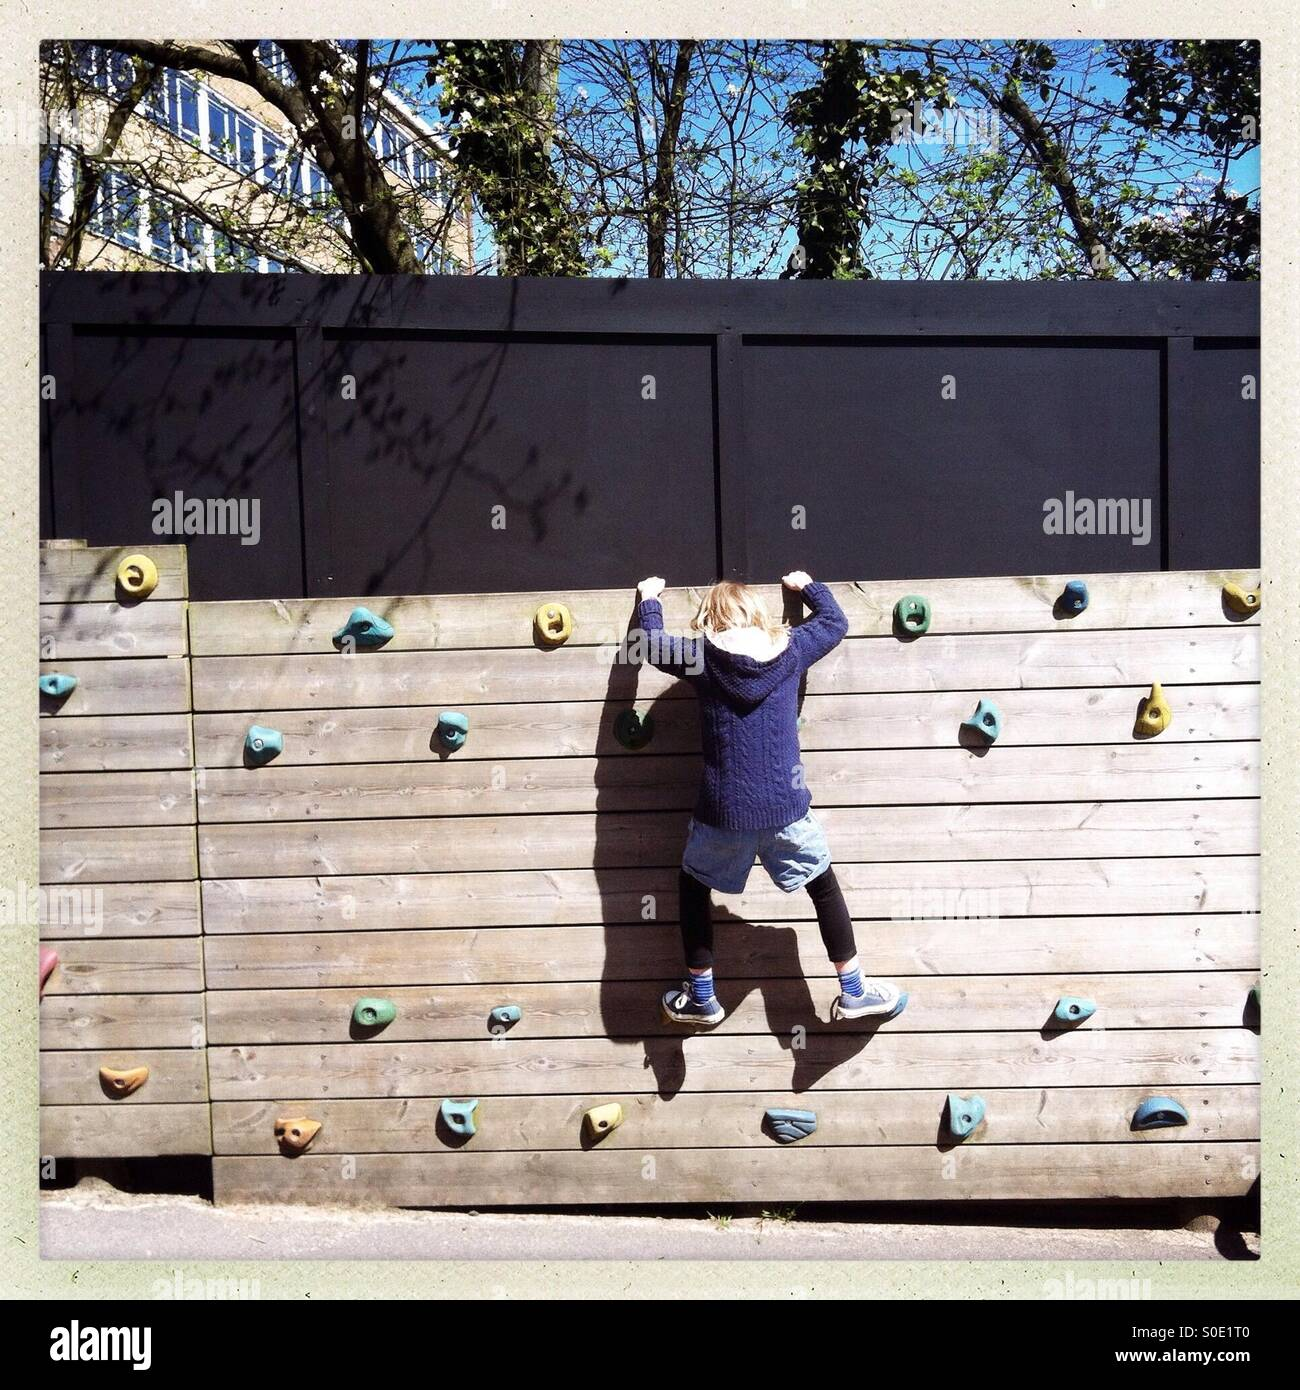 Climbing wall - Stock Image